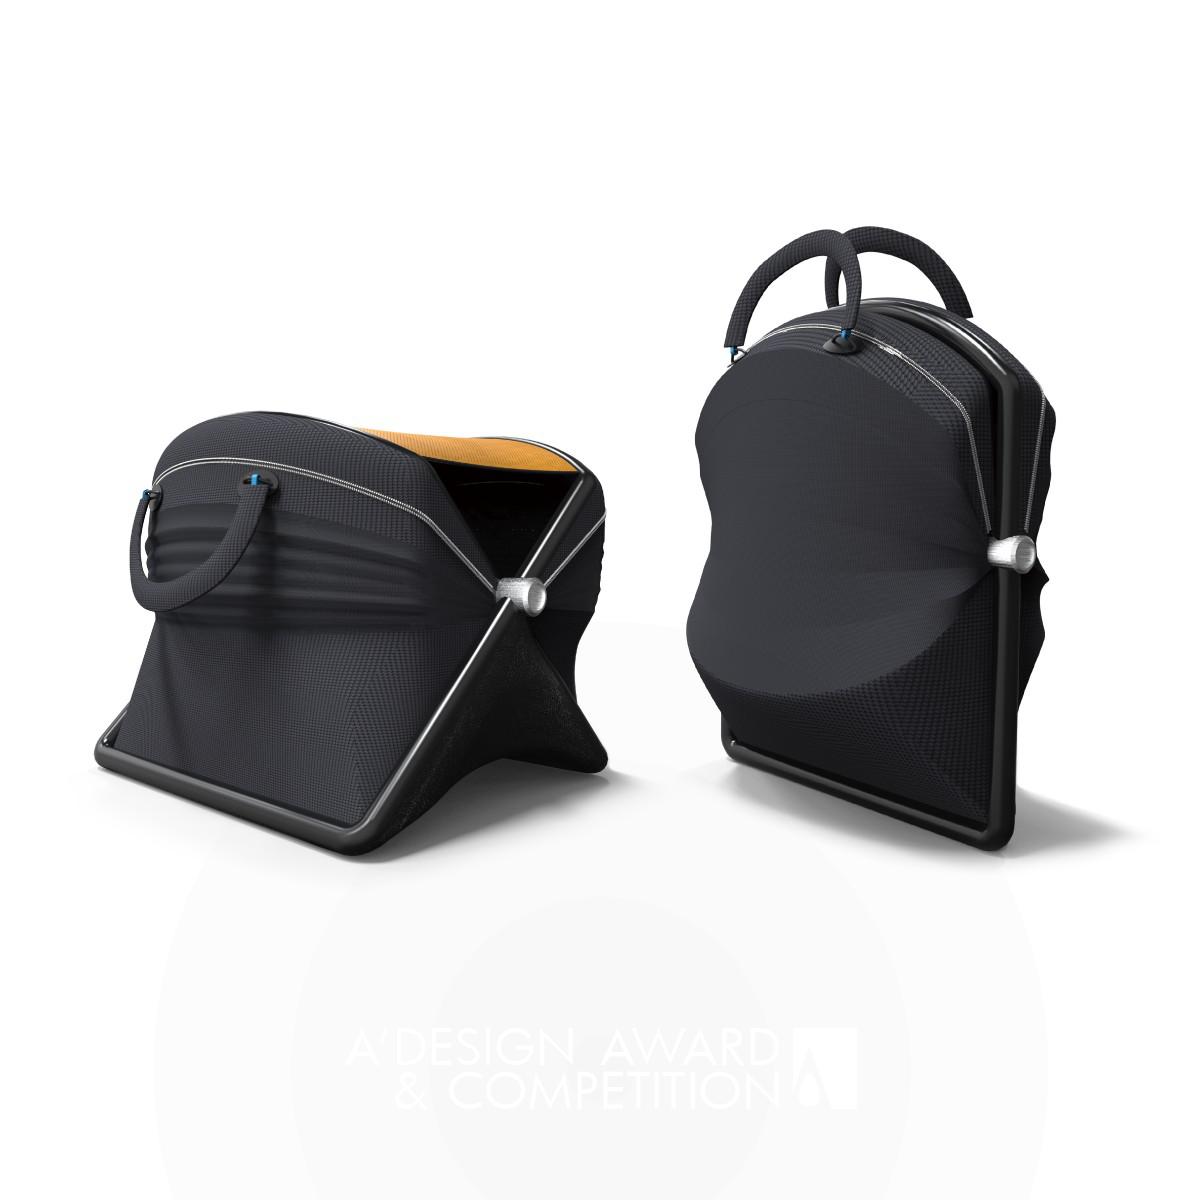 Xit Transforming Bag for Sitting